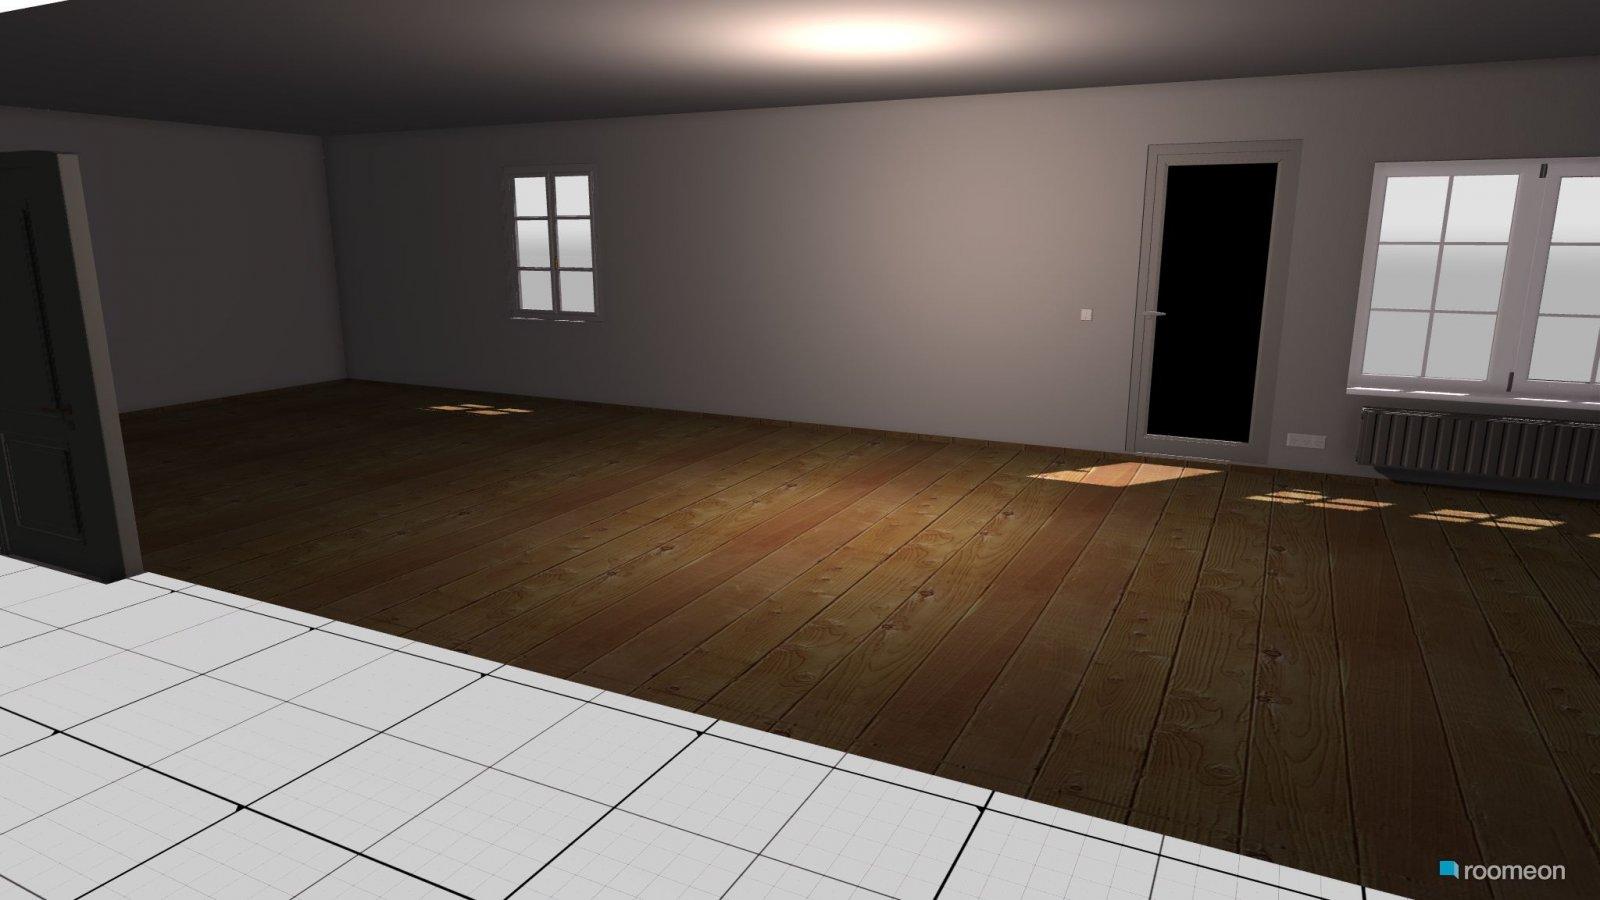 Raumplanung k che mit esszimmer roomeon community for Raumgestaltung esszimmer